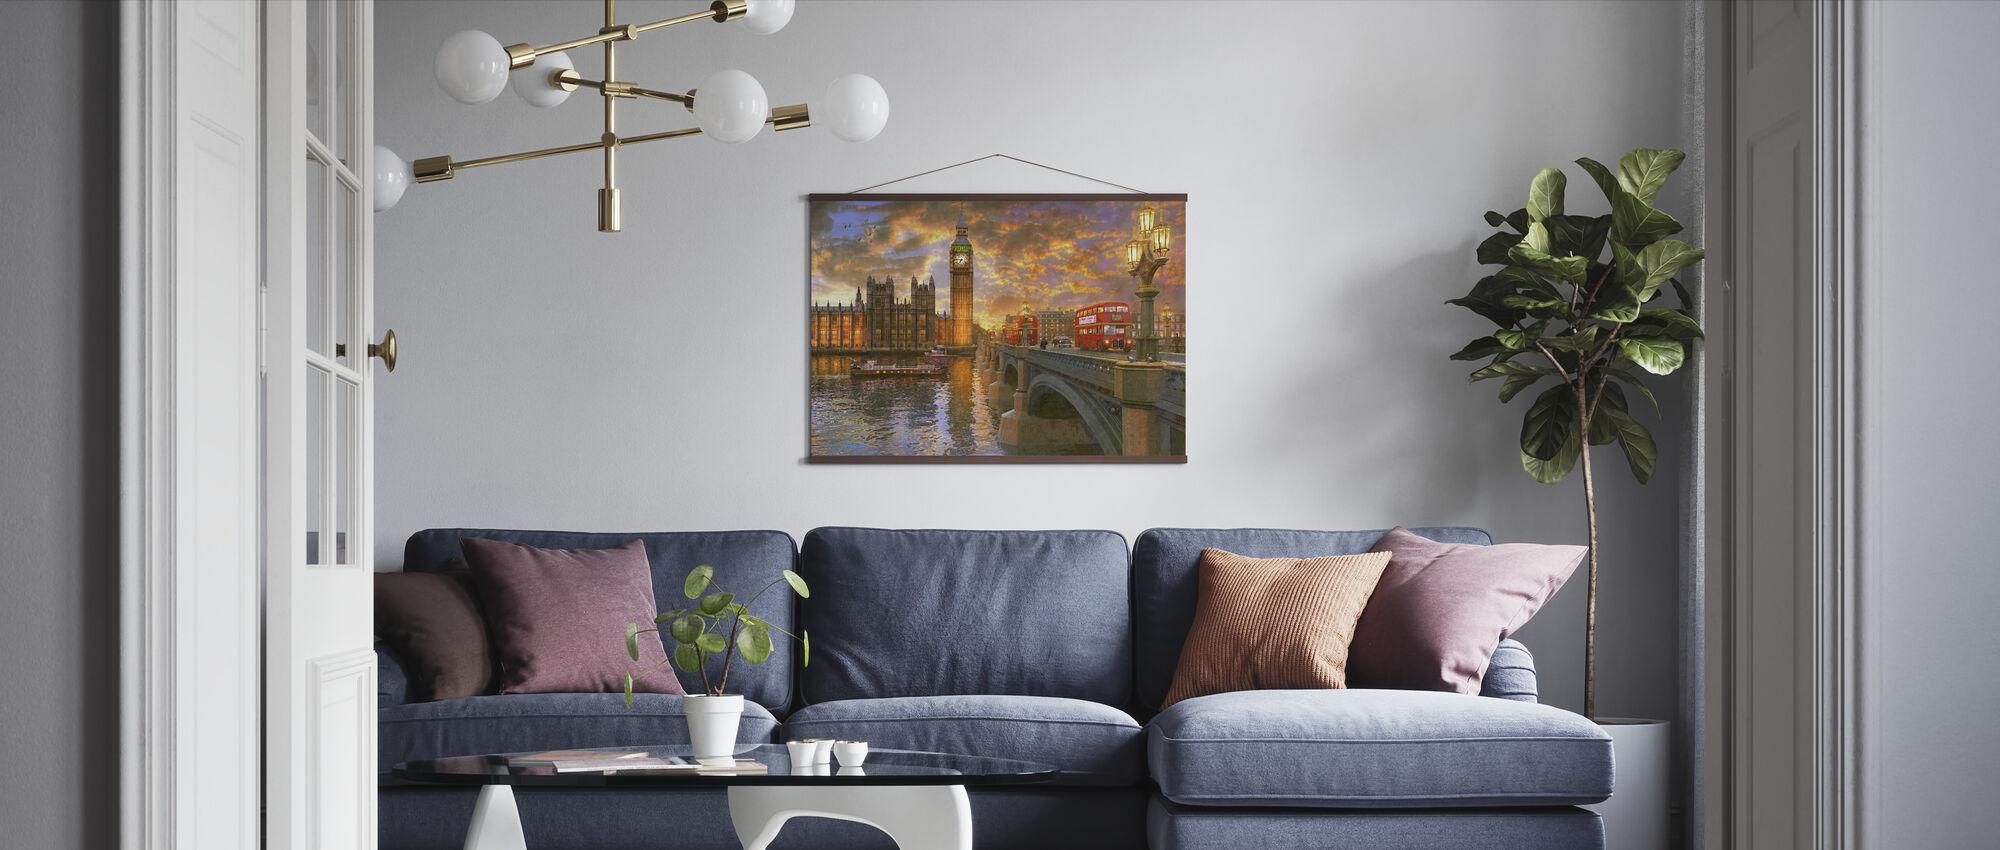 Westminster Sunset - Poster - Living Room